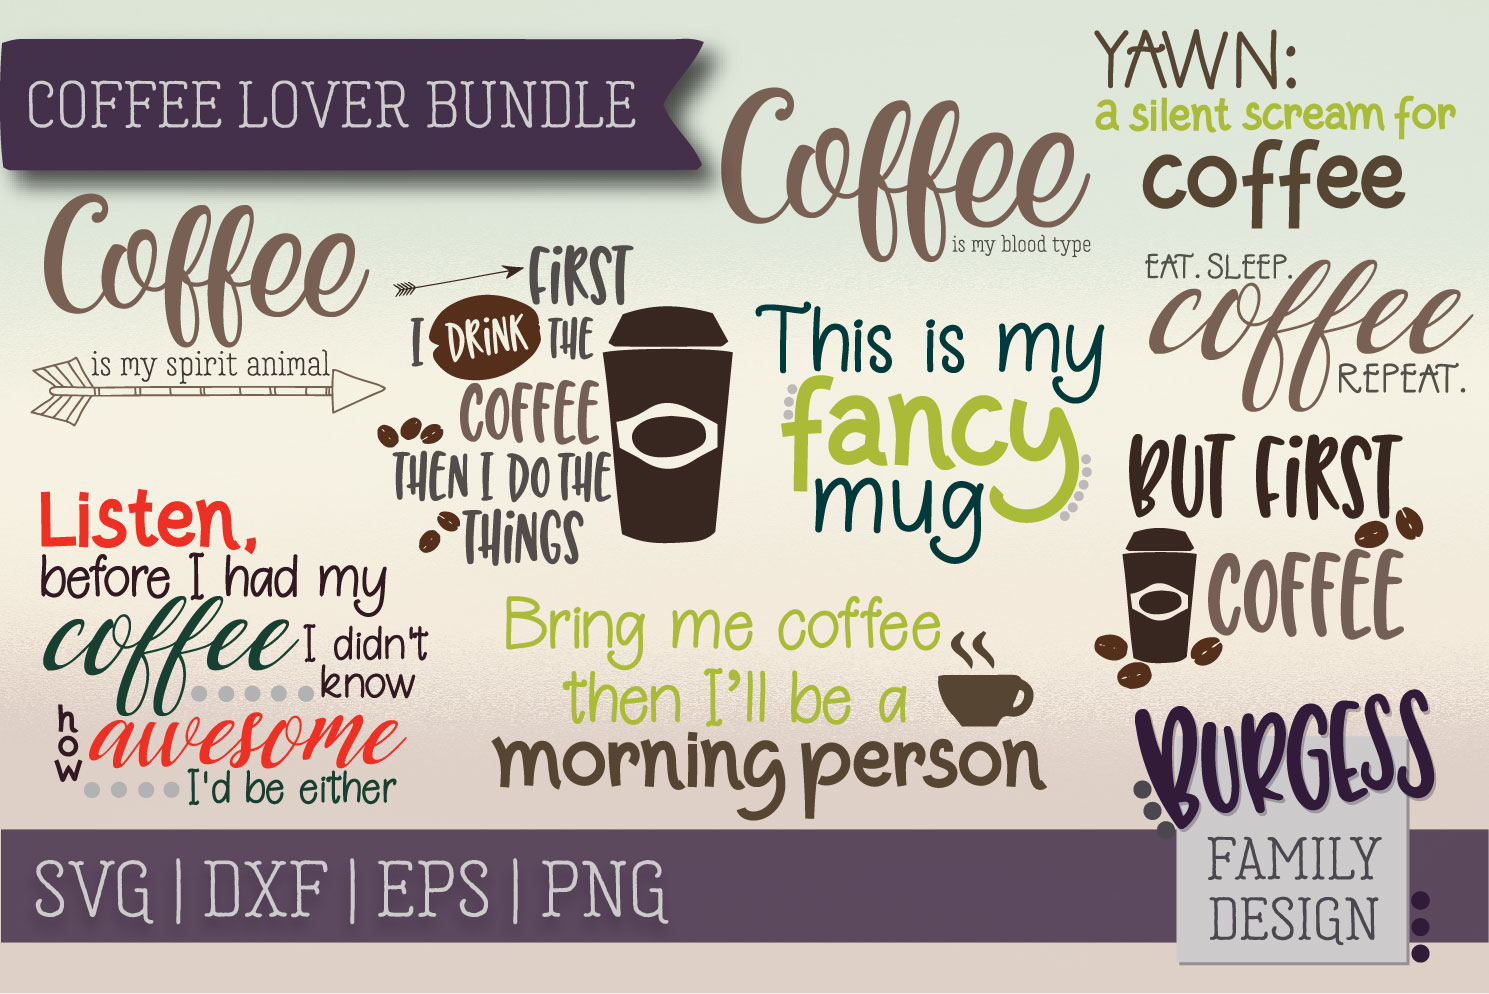 The starter bundle - Over 200 Designs | SVG DXF EPS PNG example image 11